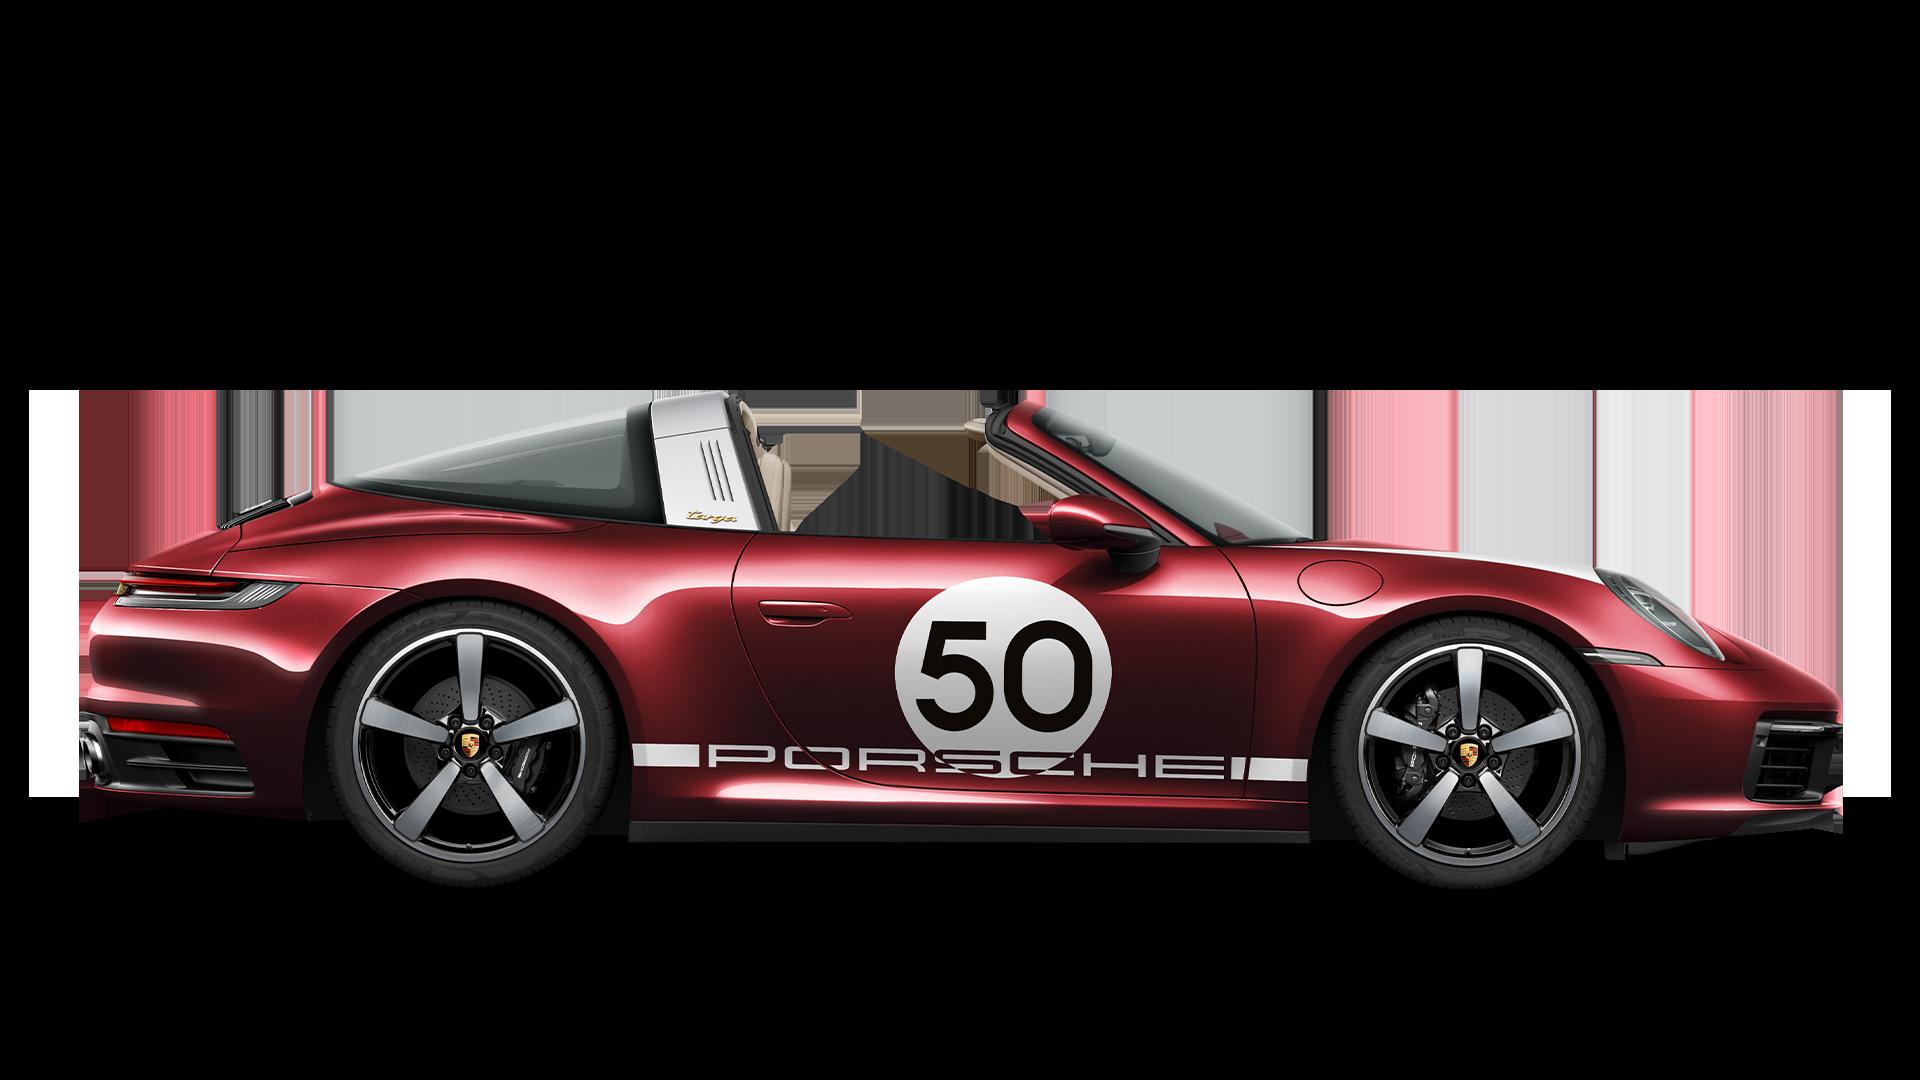 Vista General De Todos Los Modelos Porsche Porsche America Latina